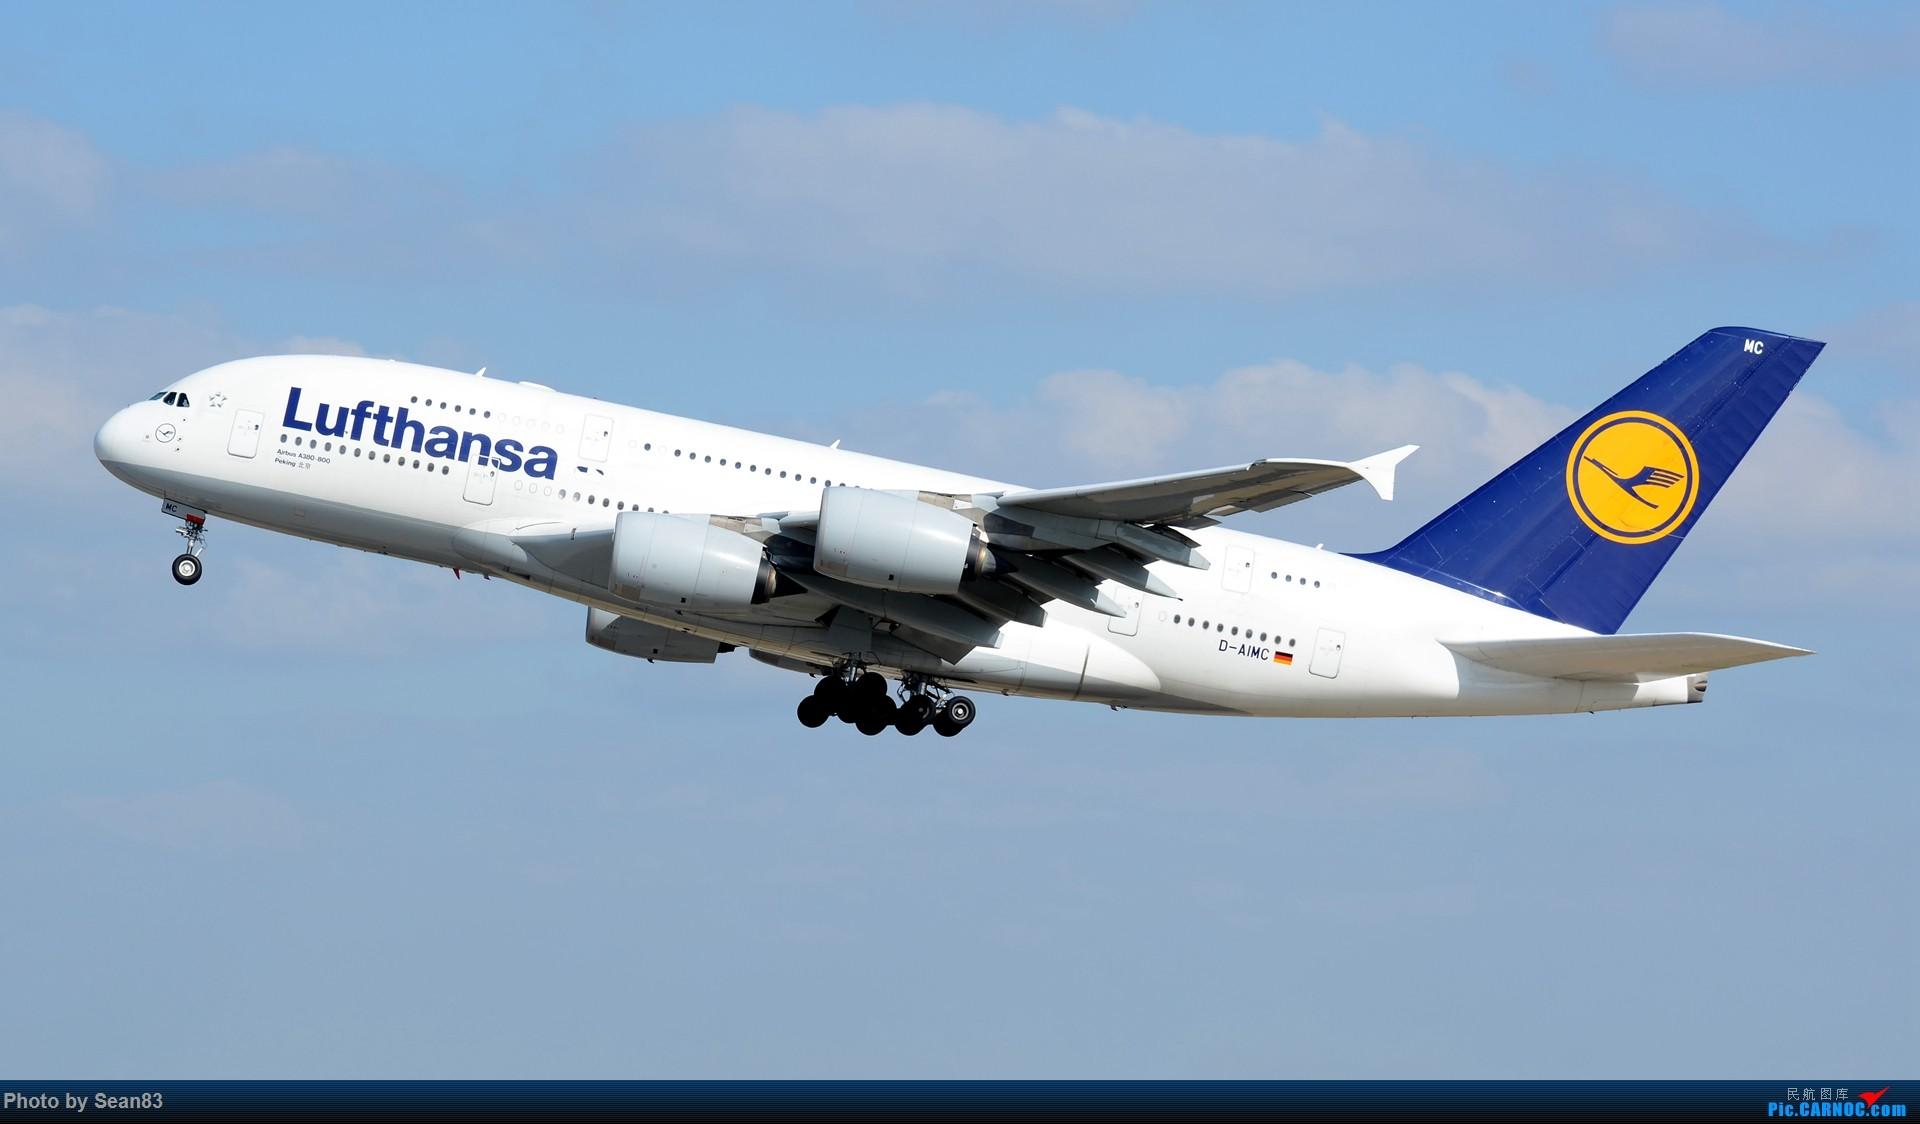 Re:[原创](1920*1080)放出一组壁纸 AIRBUS A380-800 D-AIMC 上海浦东国际机场